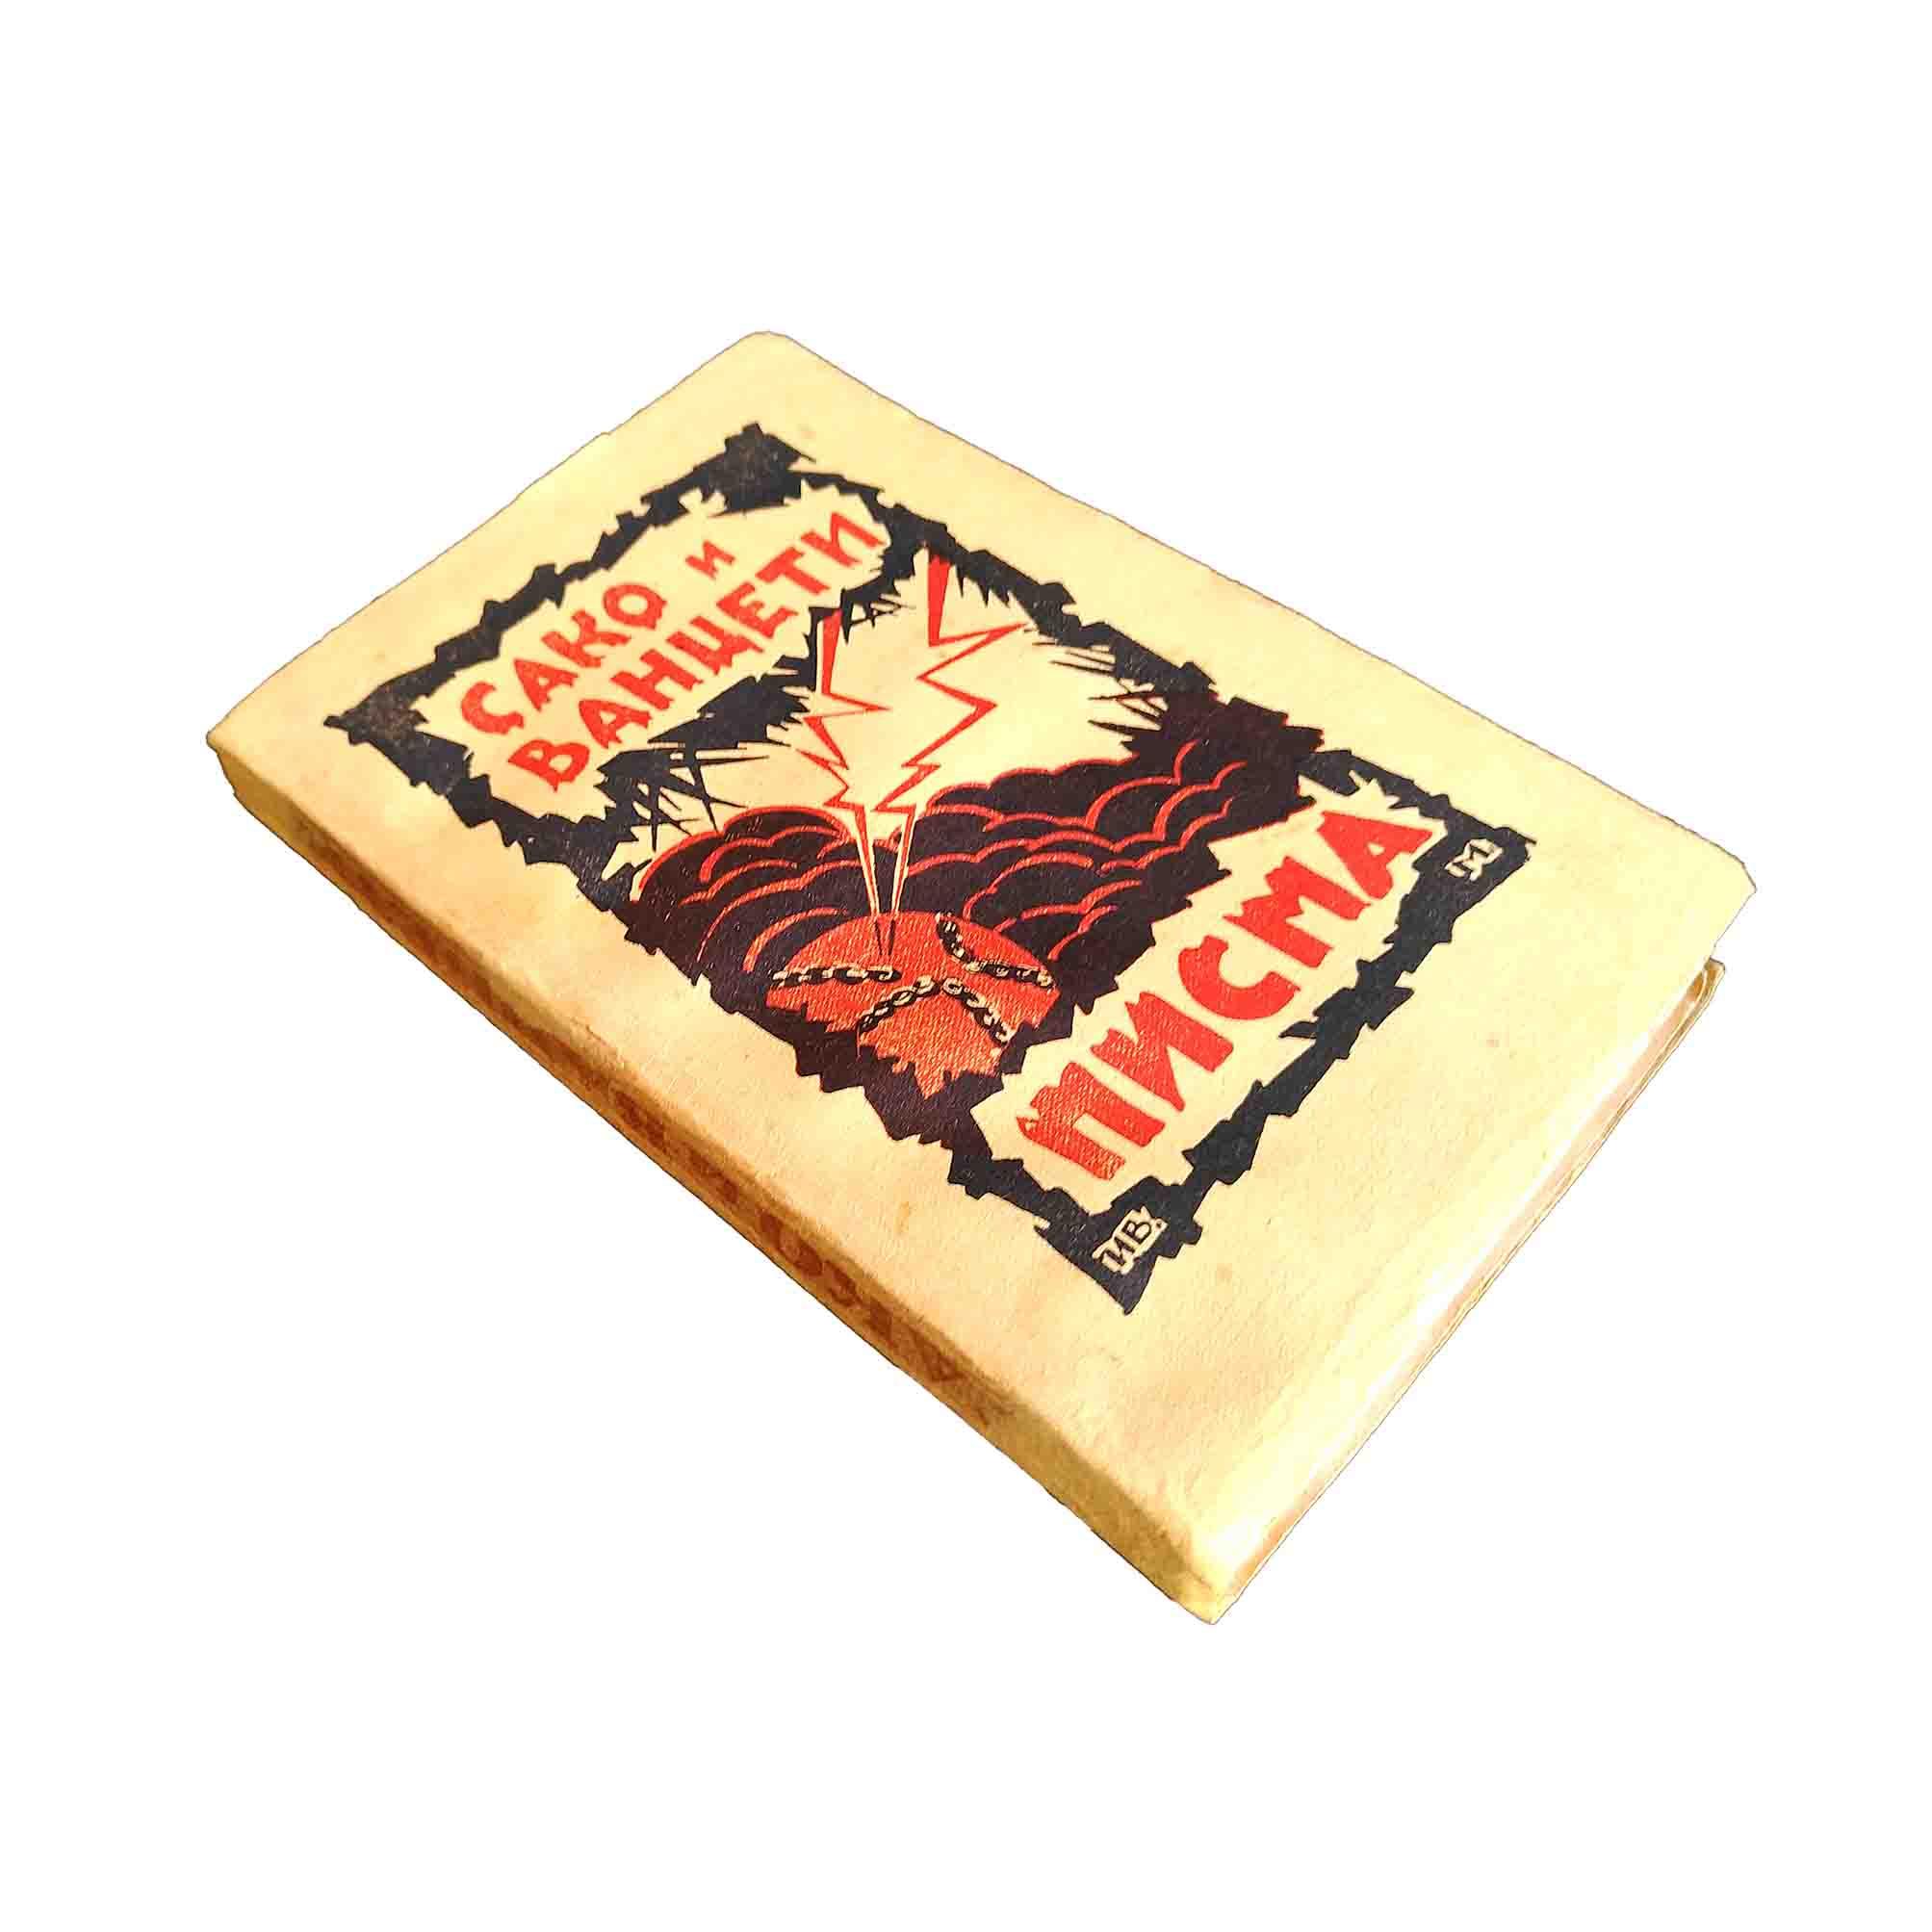 5854-Sacco-Vanzetti-Pisma-1932-Umschlag-frei-N.jpg